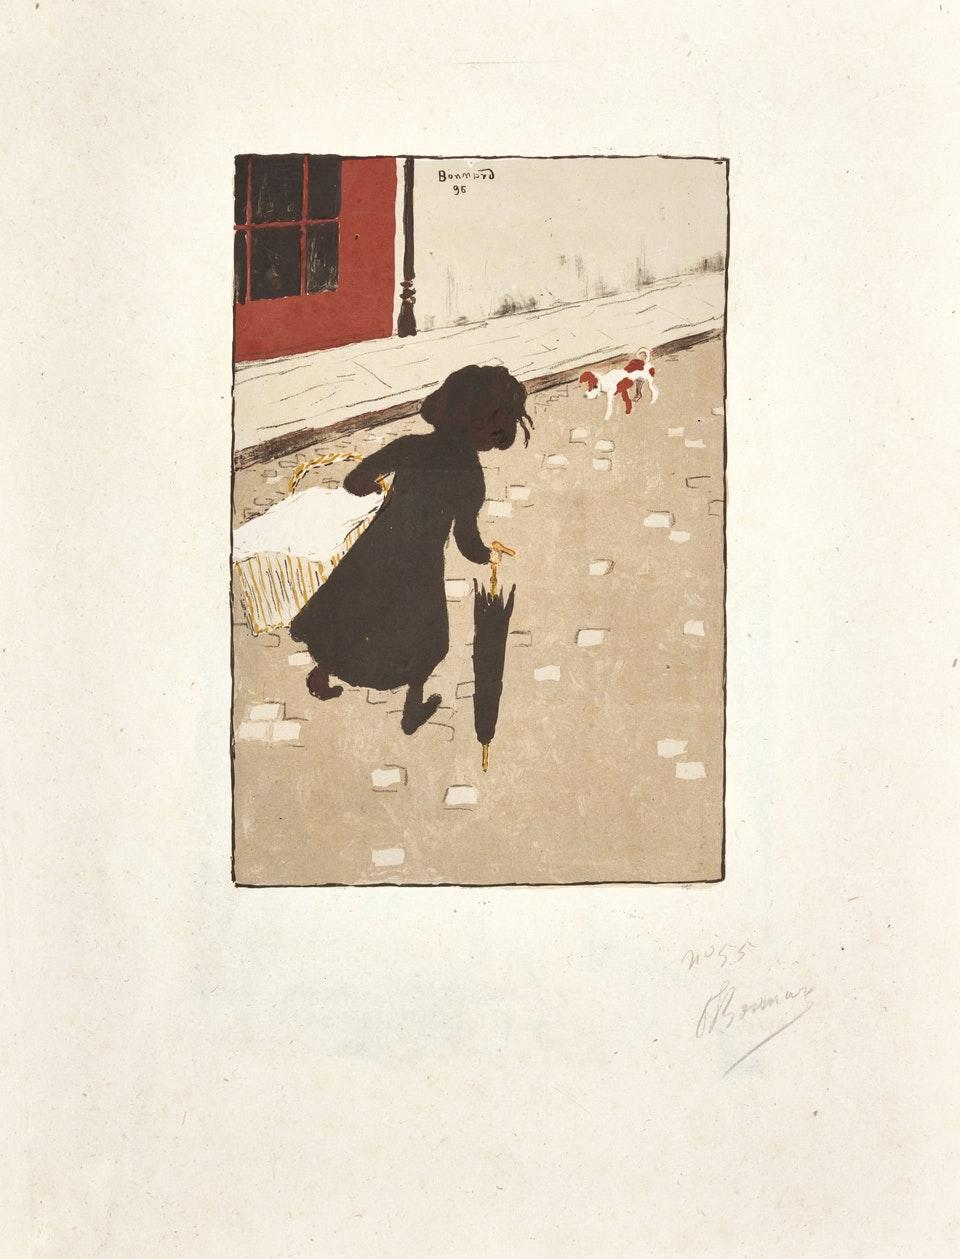 П'єр Боннар, «Маленька прачка». Світлина: 2019 Artists Rights Society (ARS), New York / ADAGP, Paris